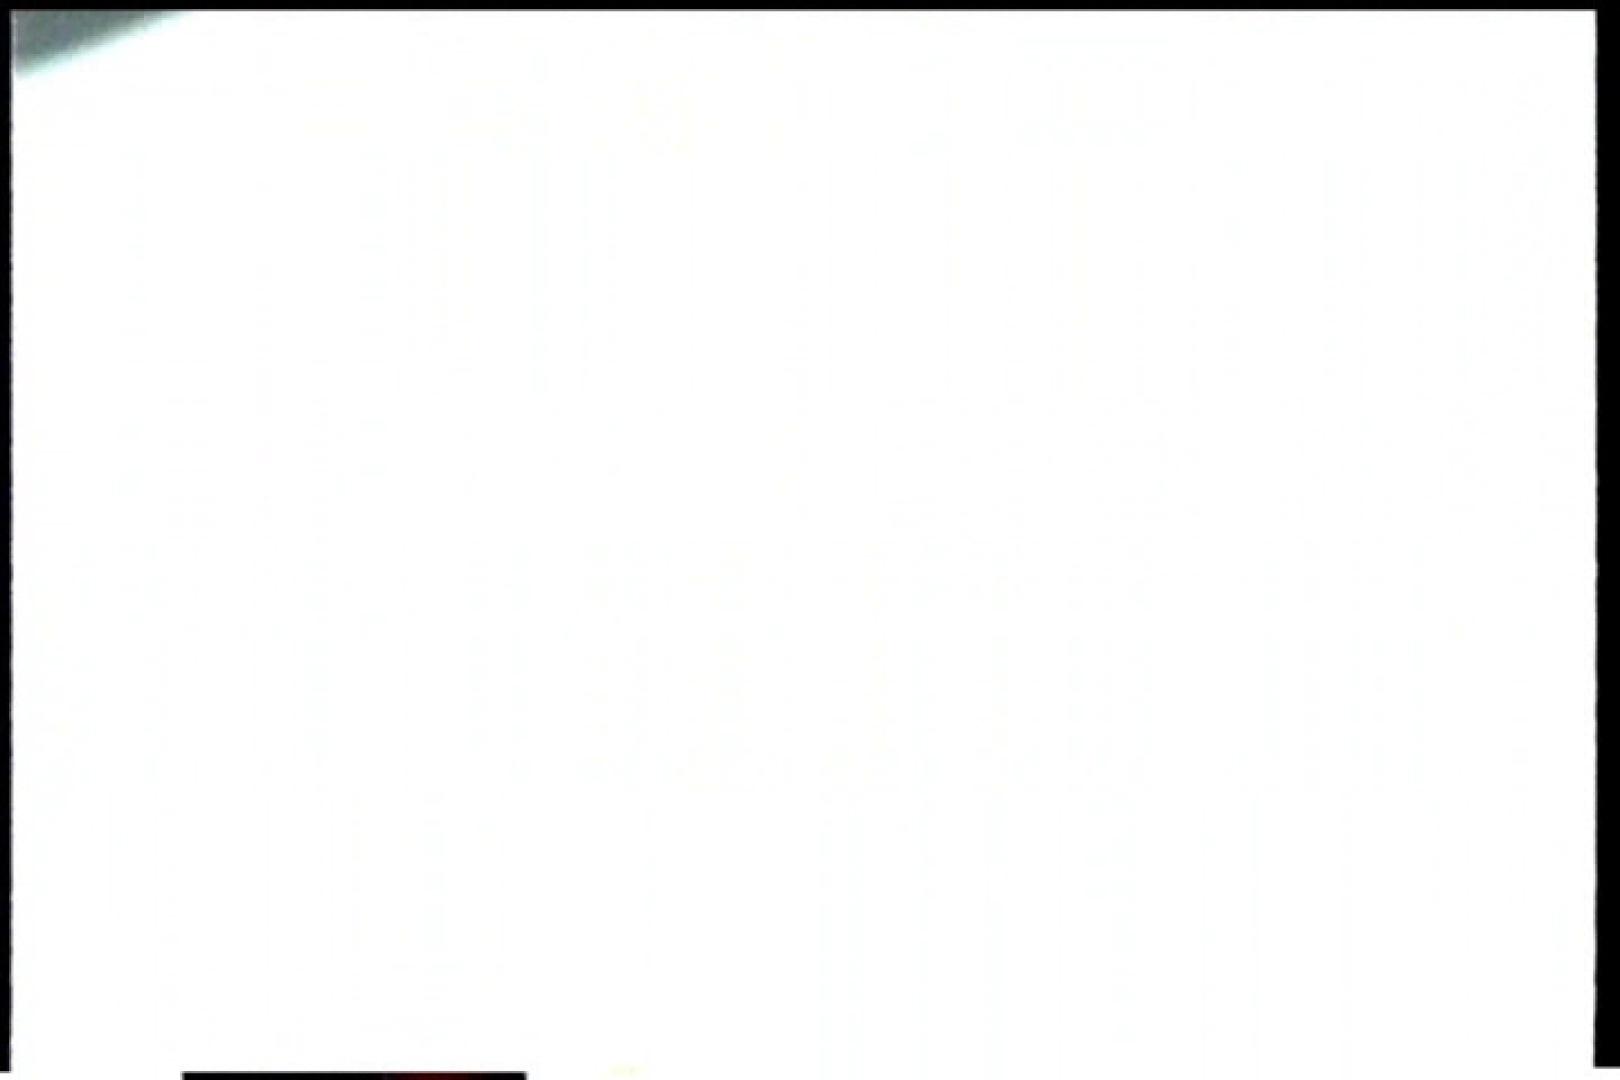 充血監督の深夜の運動会Vol.224 OL女体  99連発 90